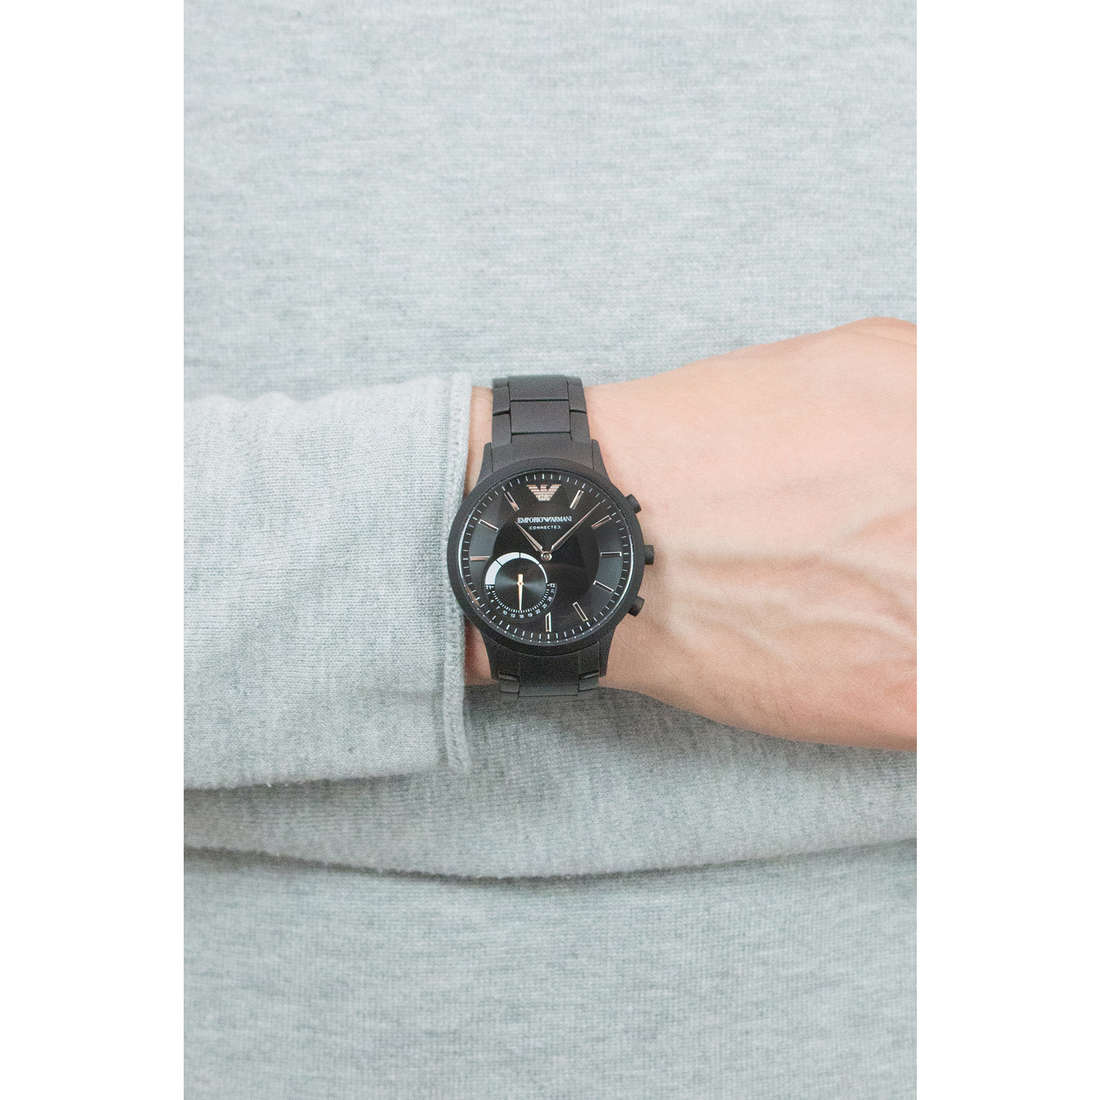 Emporio Armani Smartwatches uomo ART3001 indosso